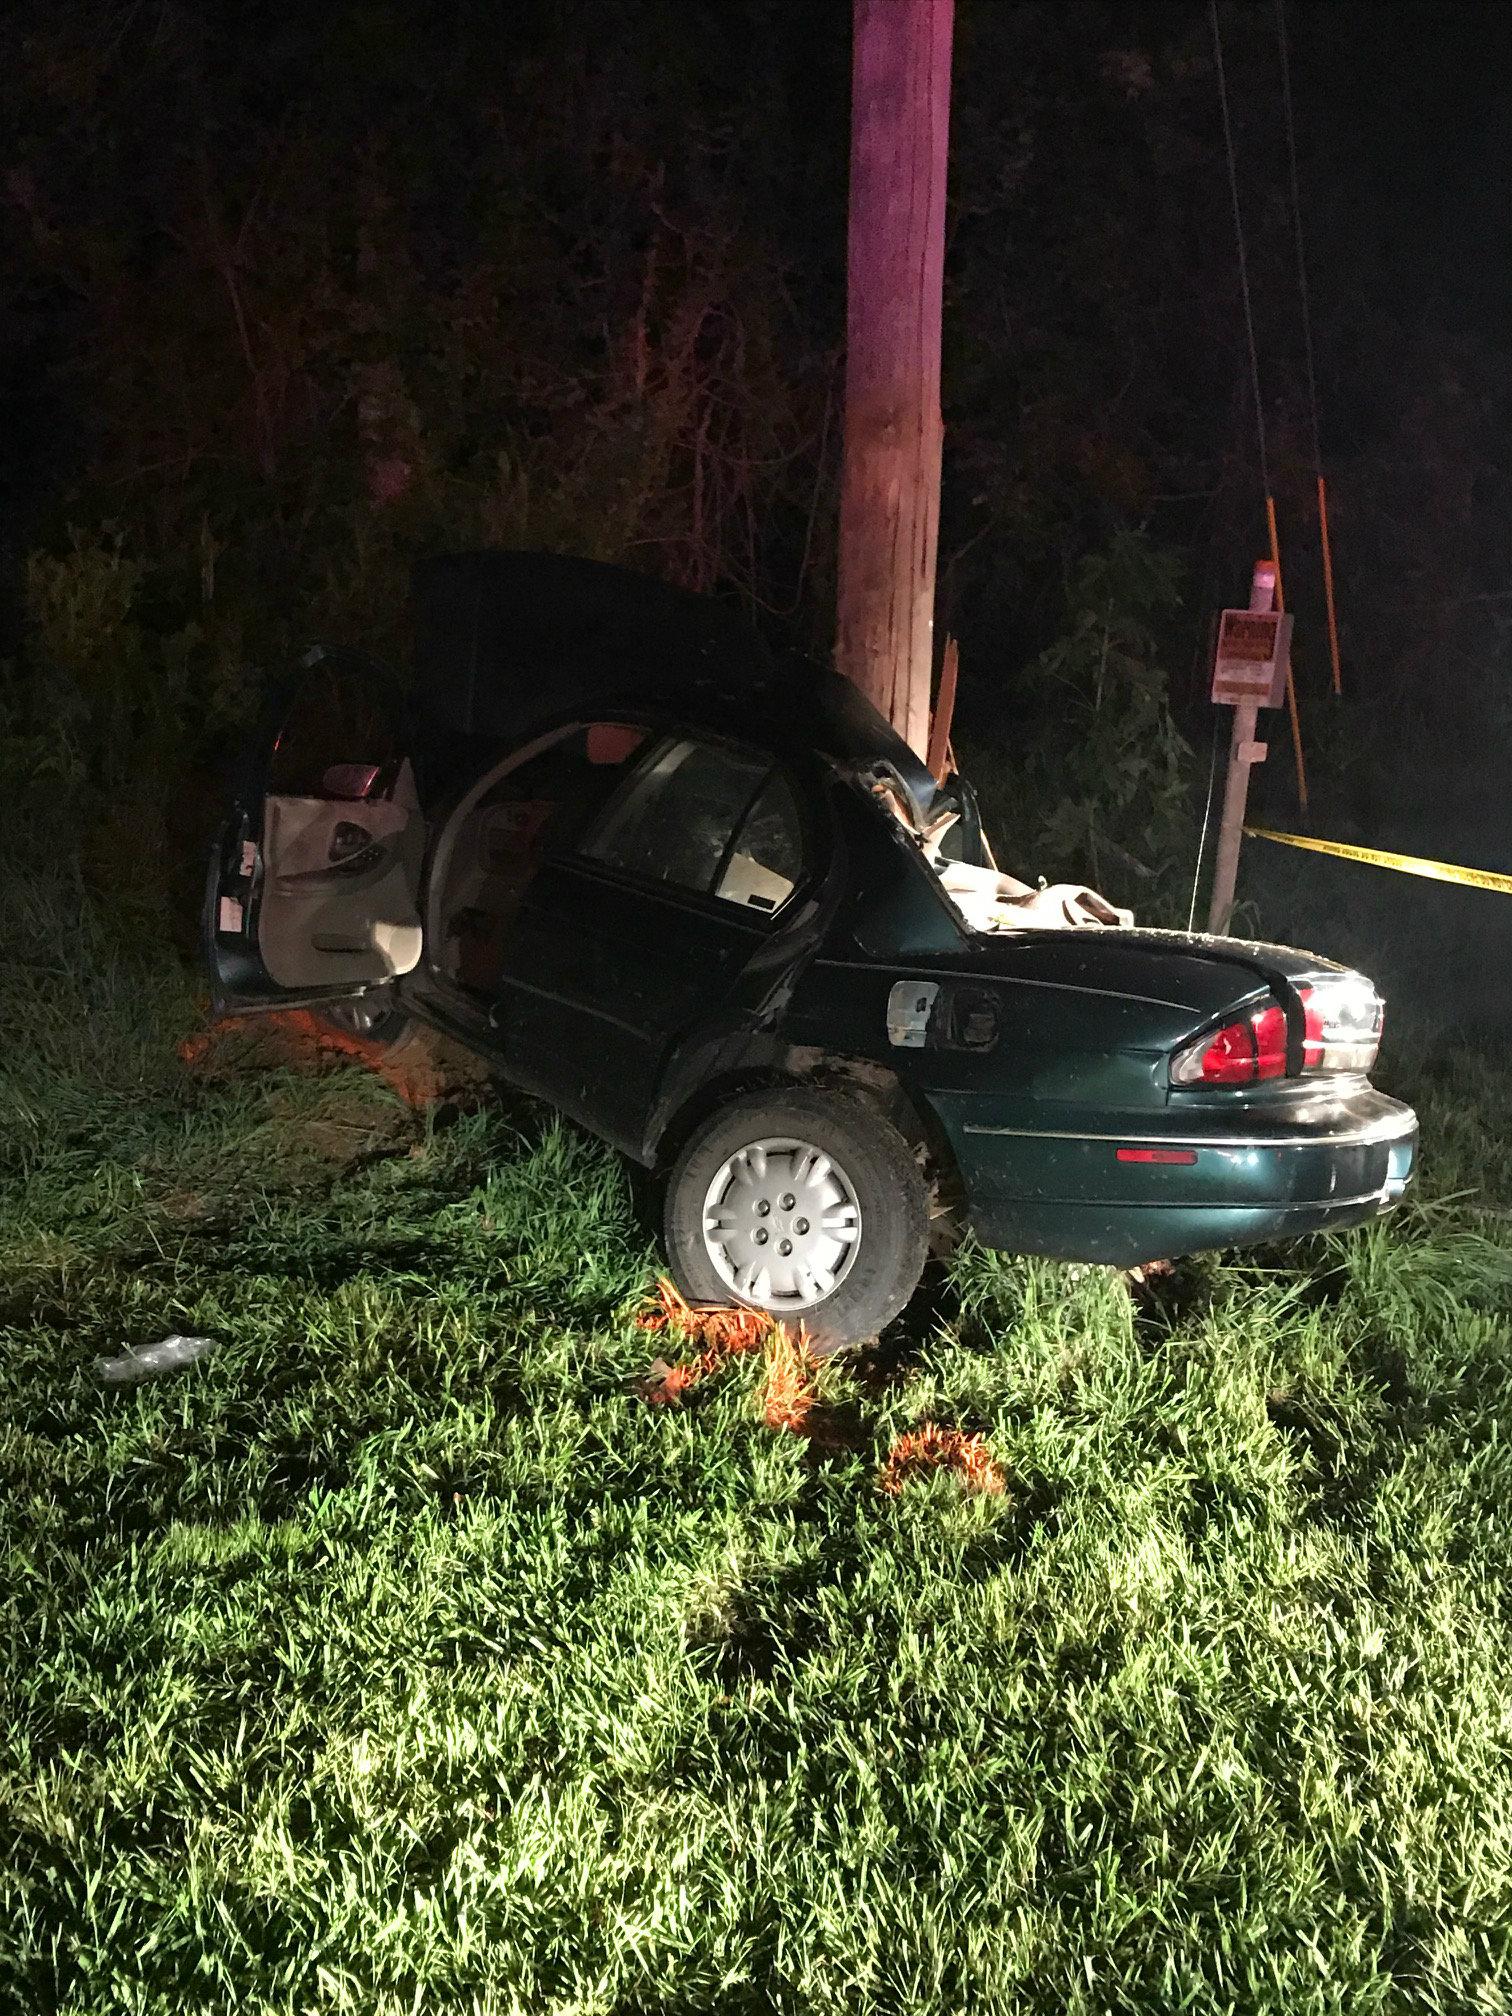 Deadly Yazoo County crash under investigation